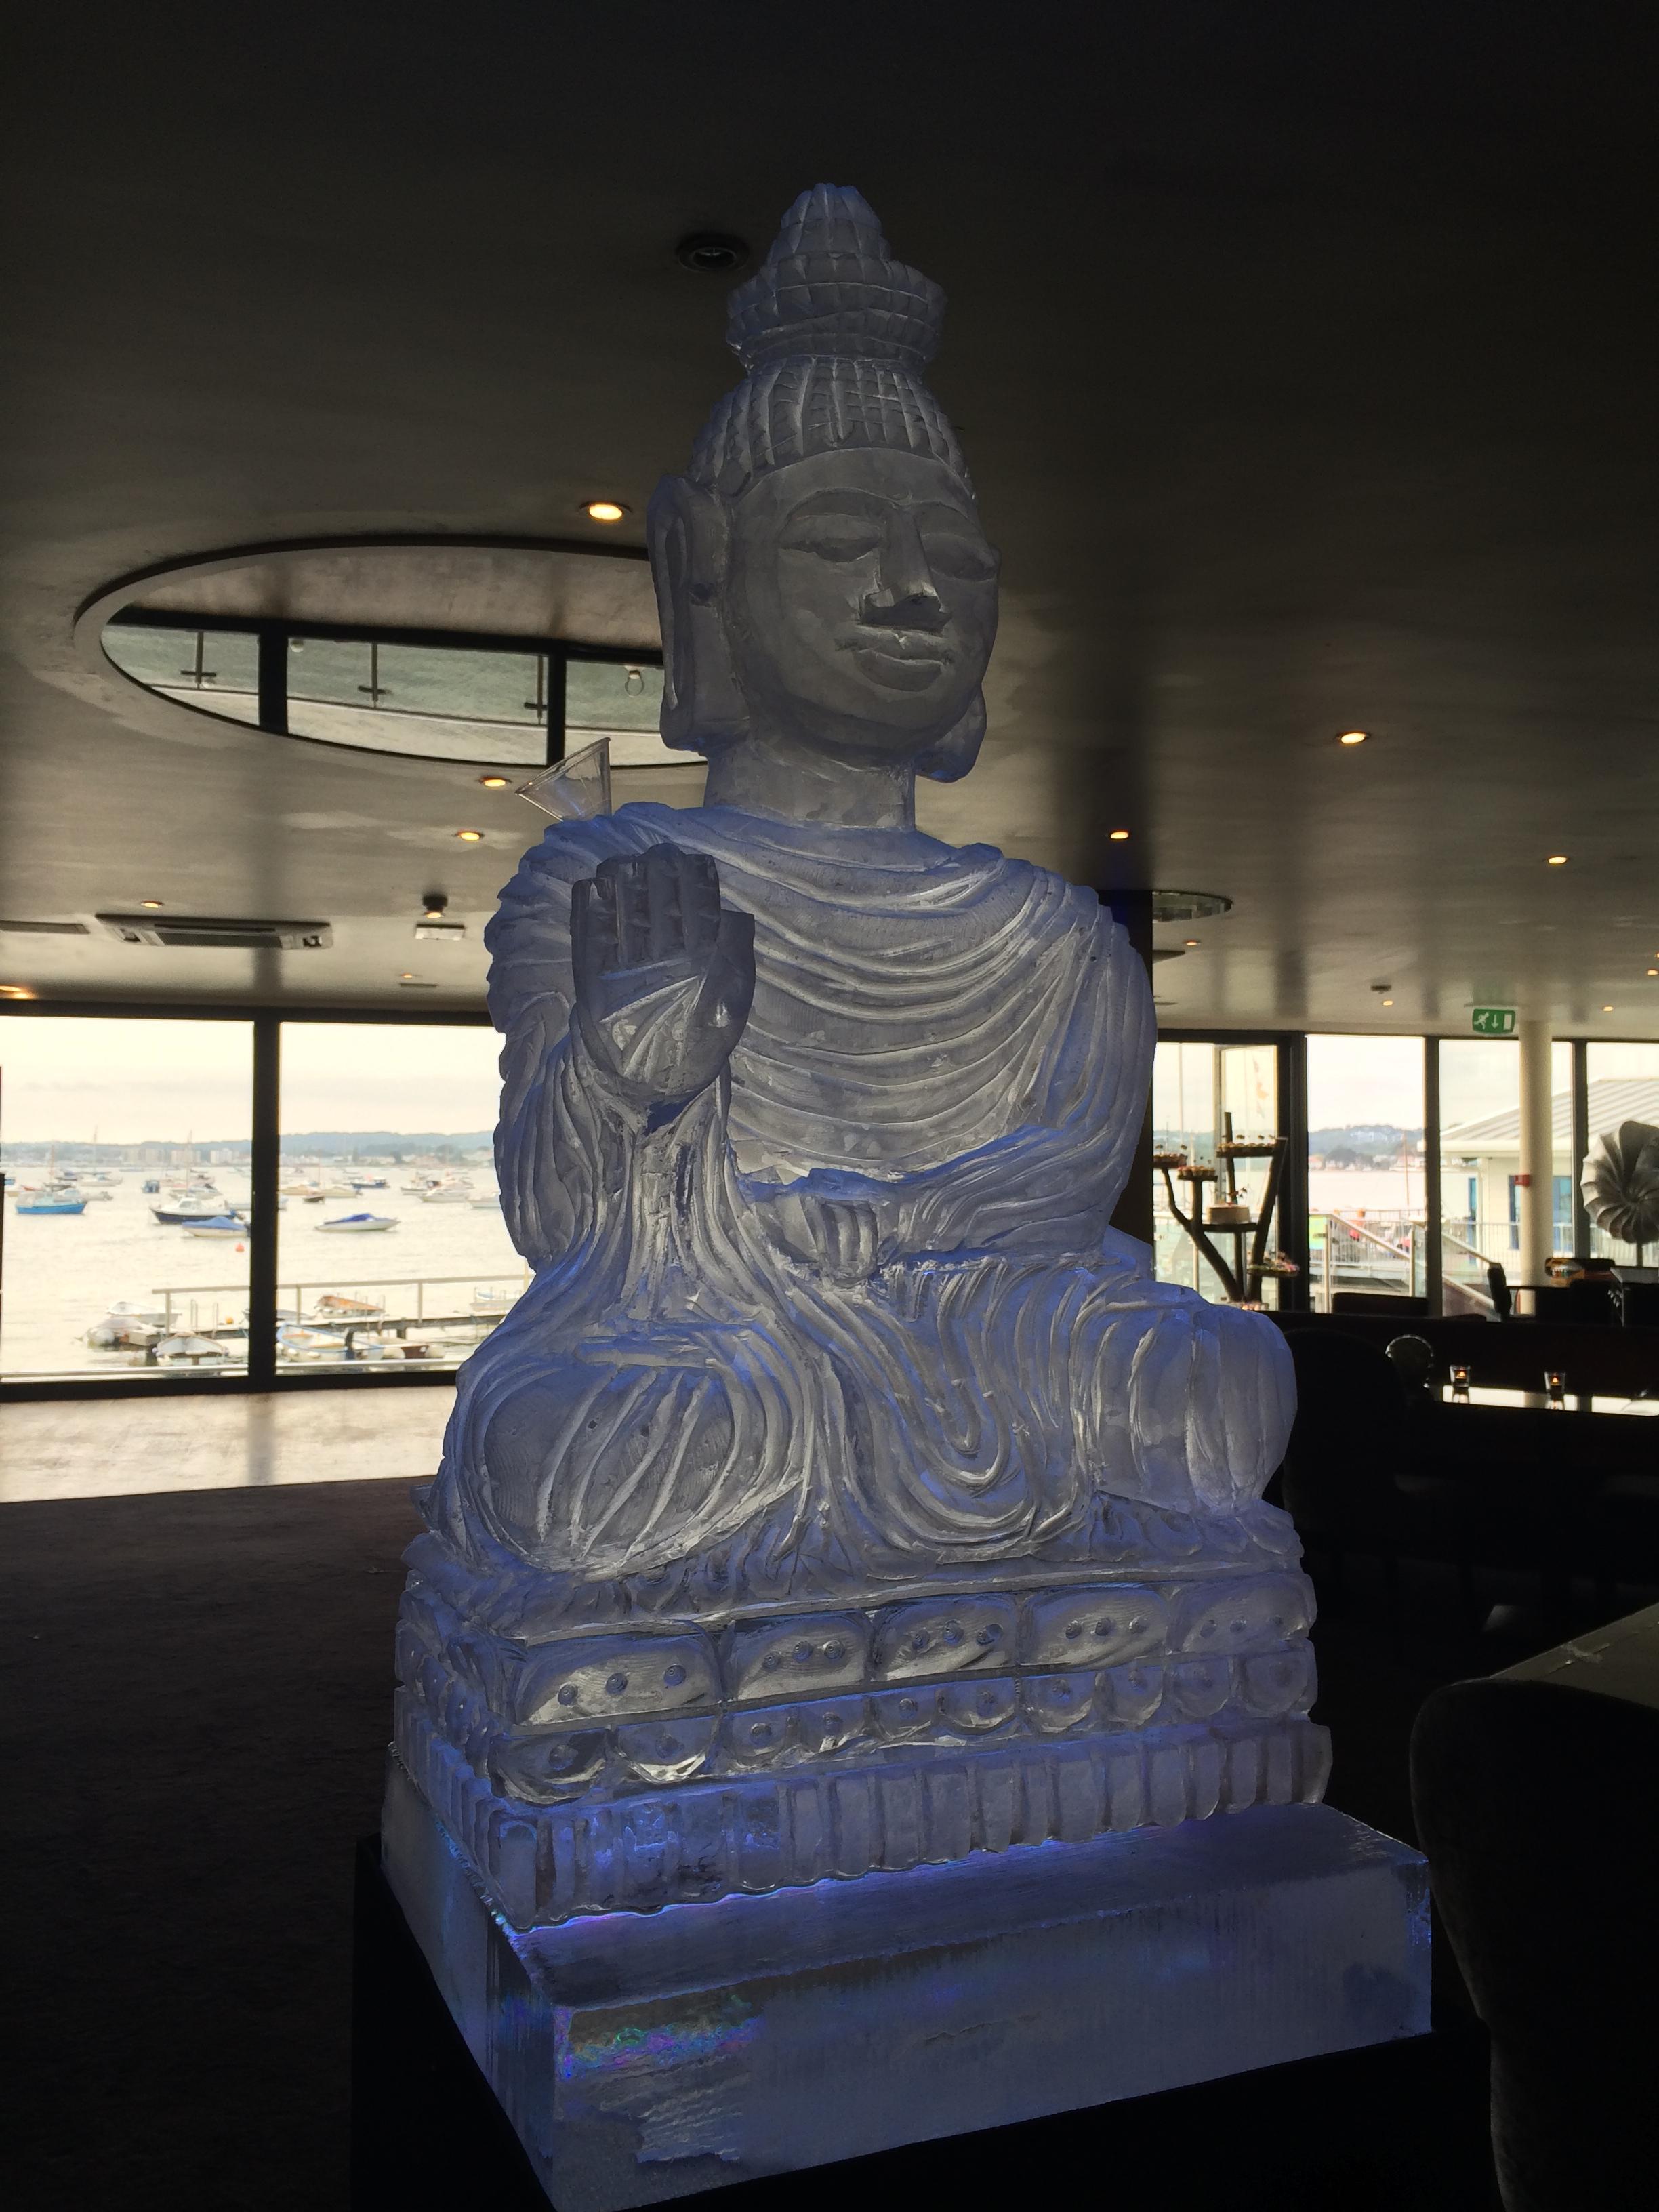 Buddah - Cool As Ice (Vodka Luge)